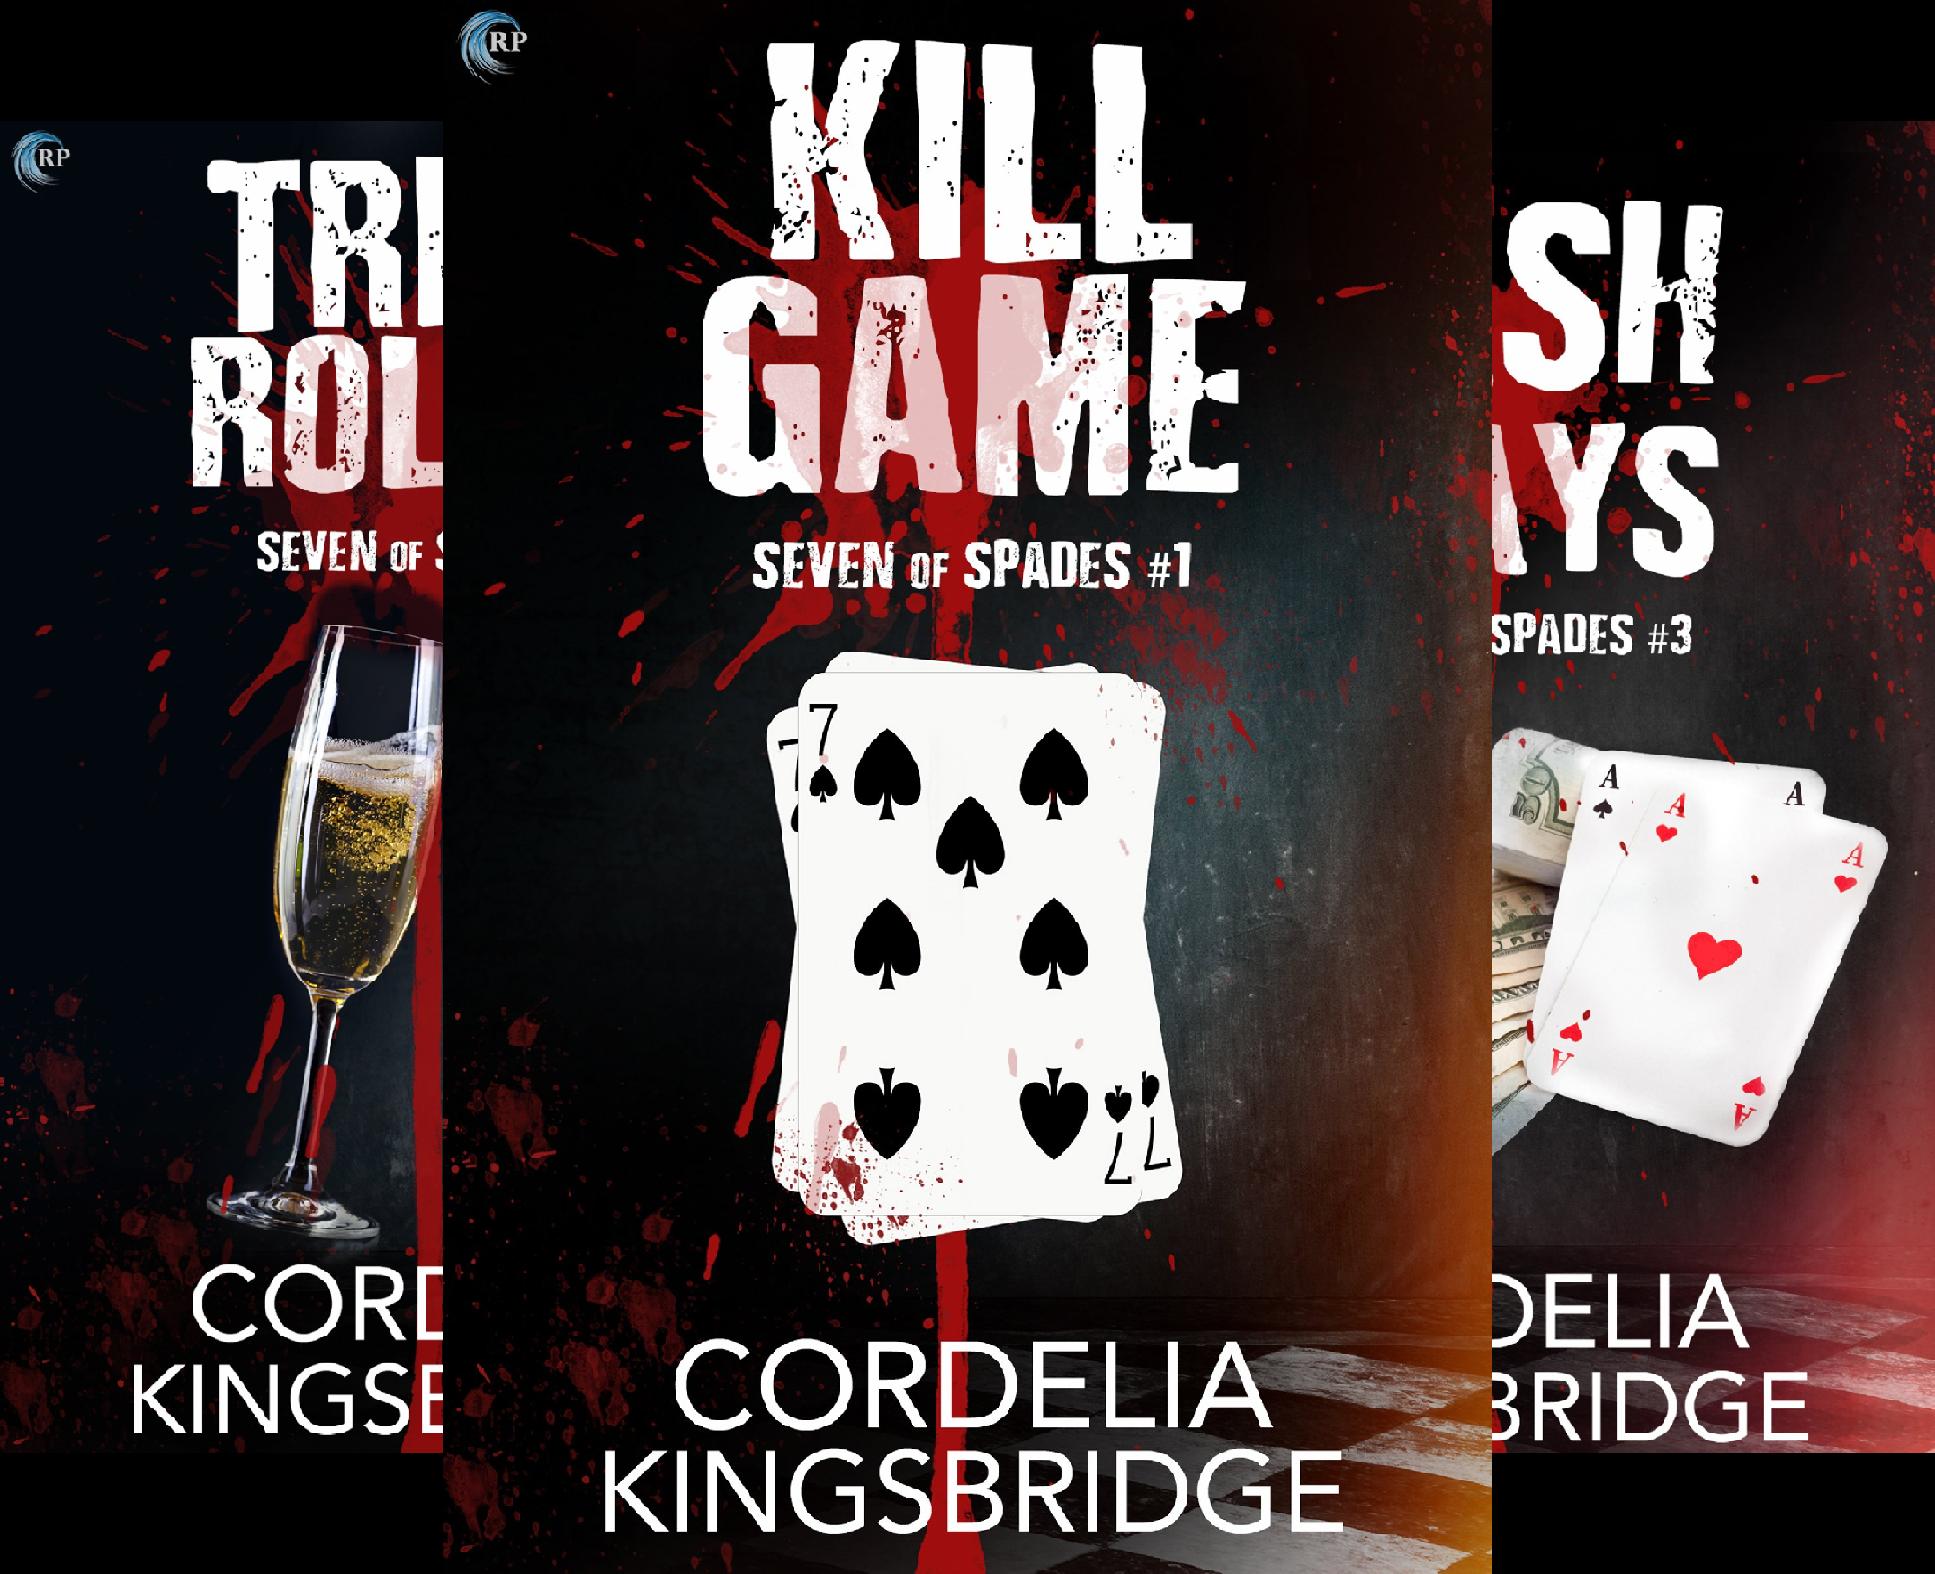 Best cash plays cordelia kingsbridge